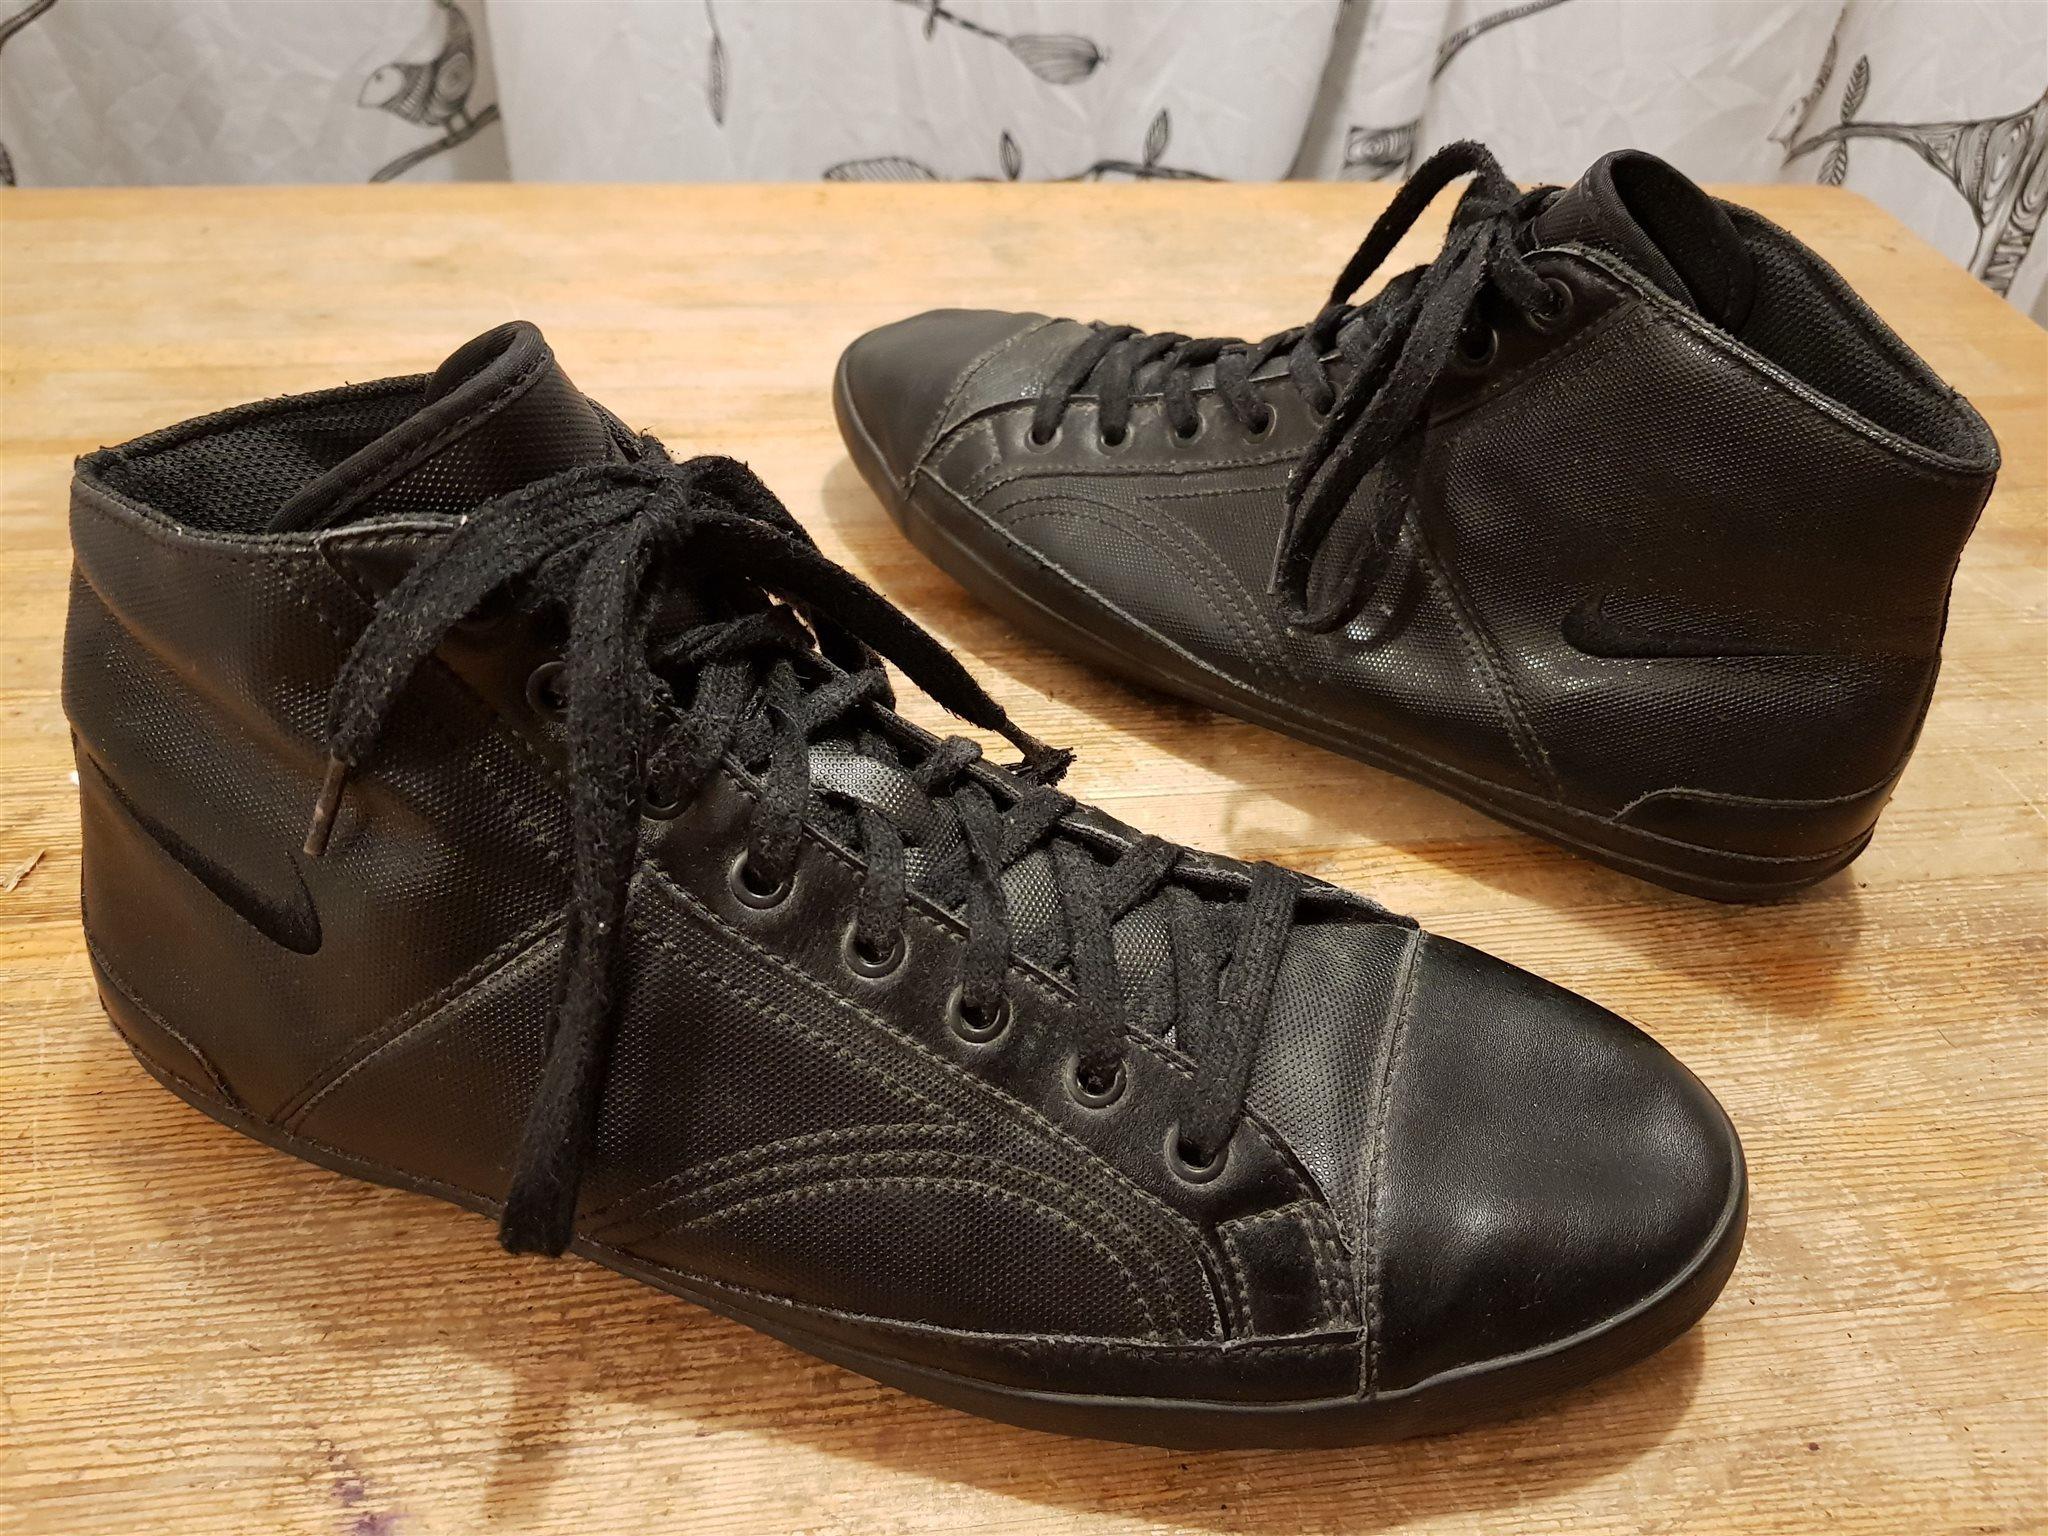 online retailer 8185e 1f2d3 Sneakers Nike fritidsskor str 44,5 i fint skick